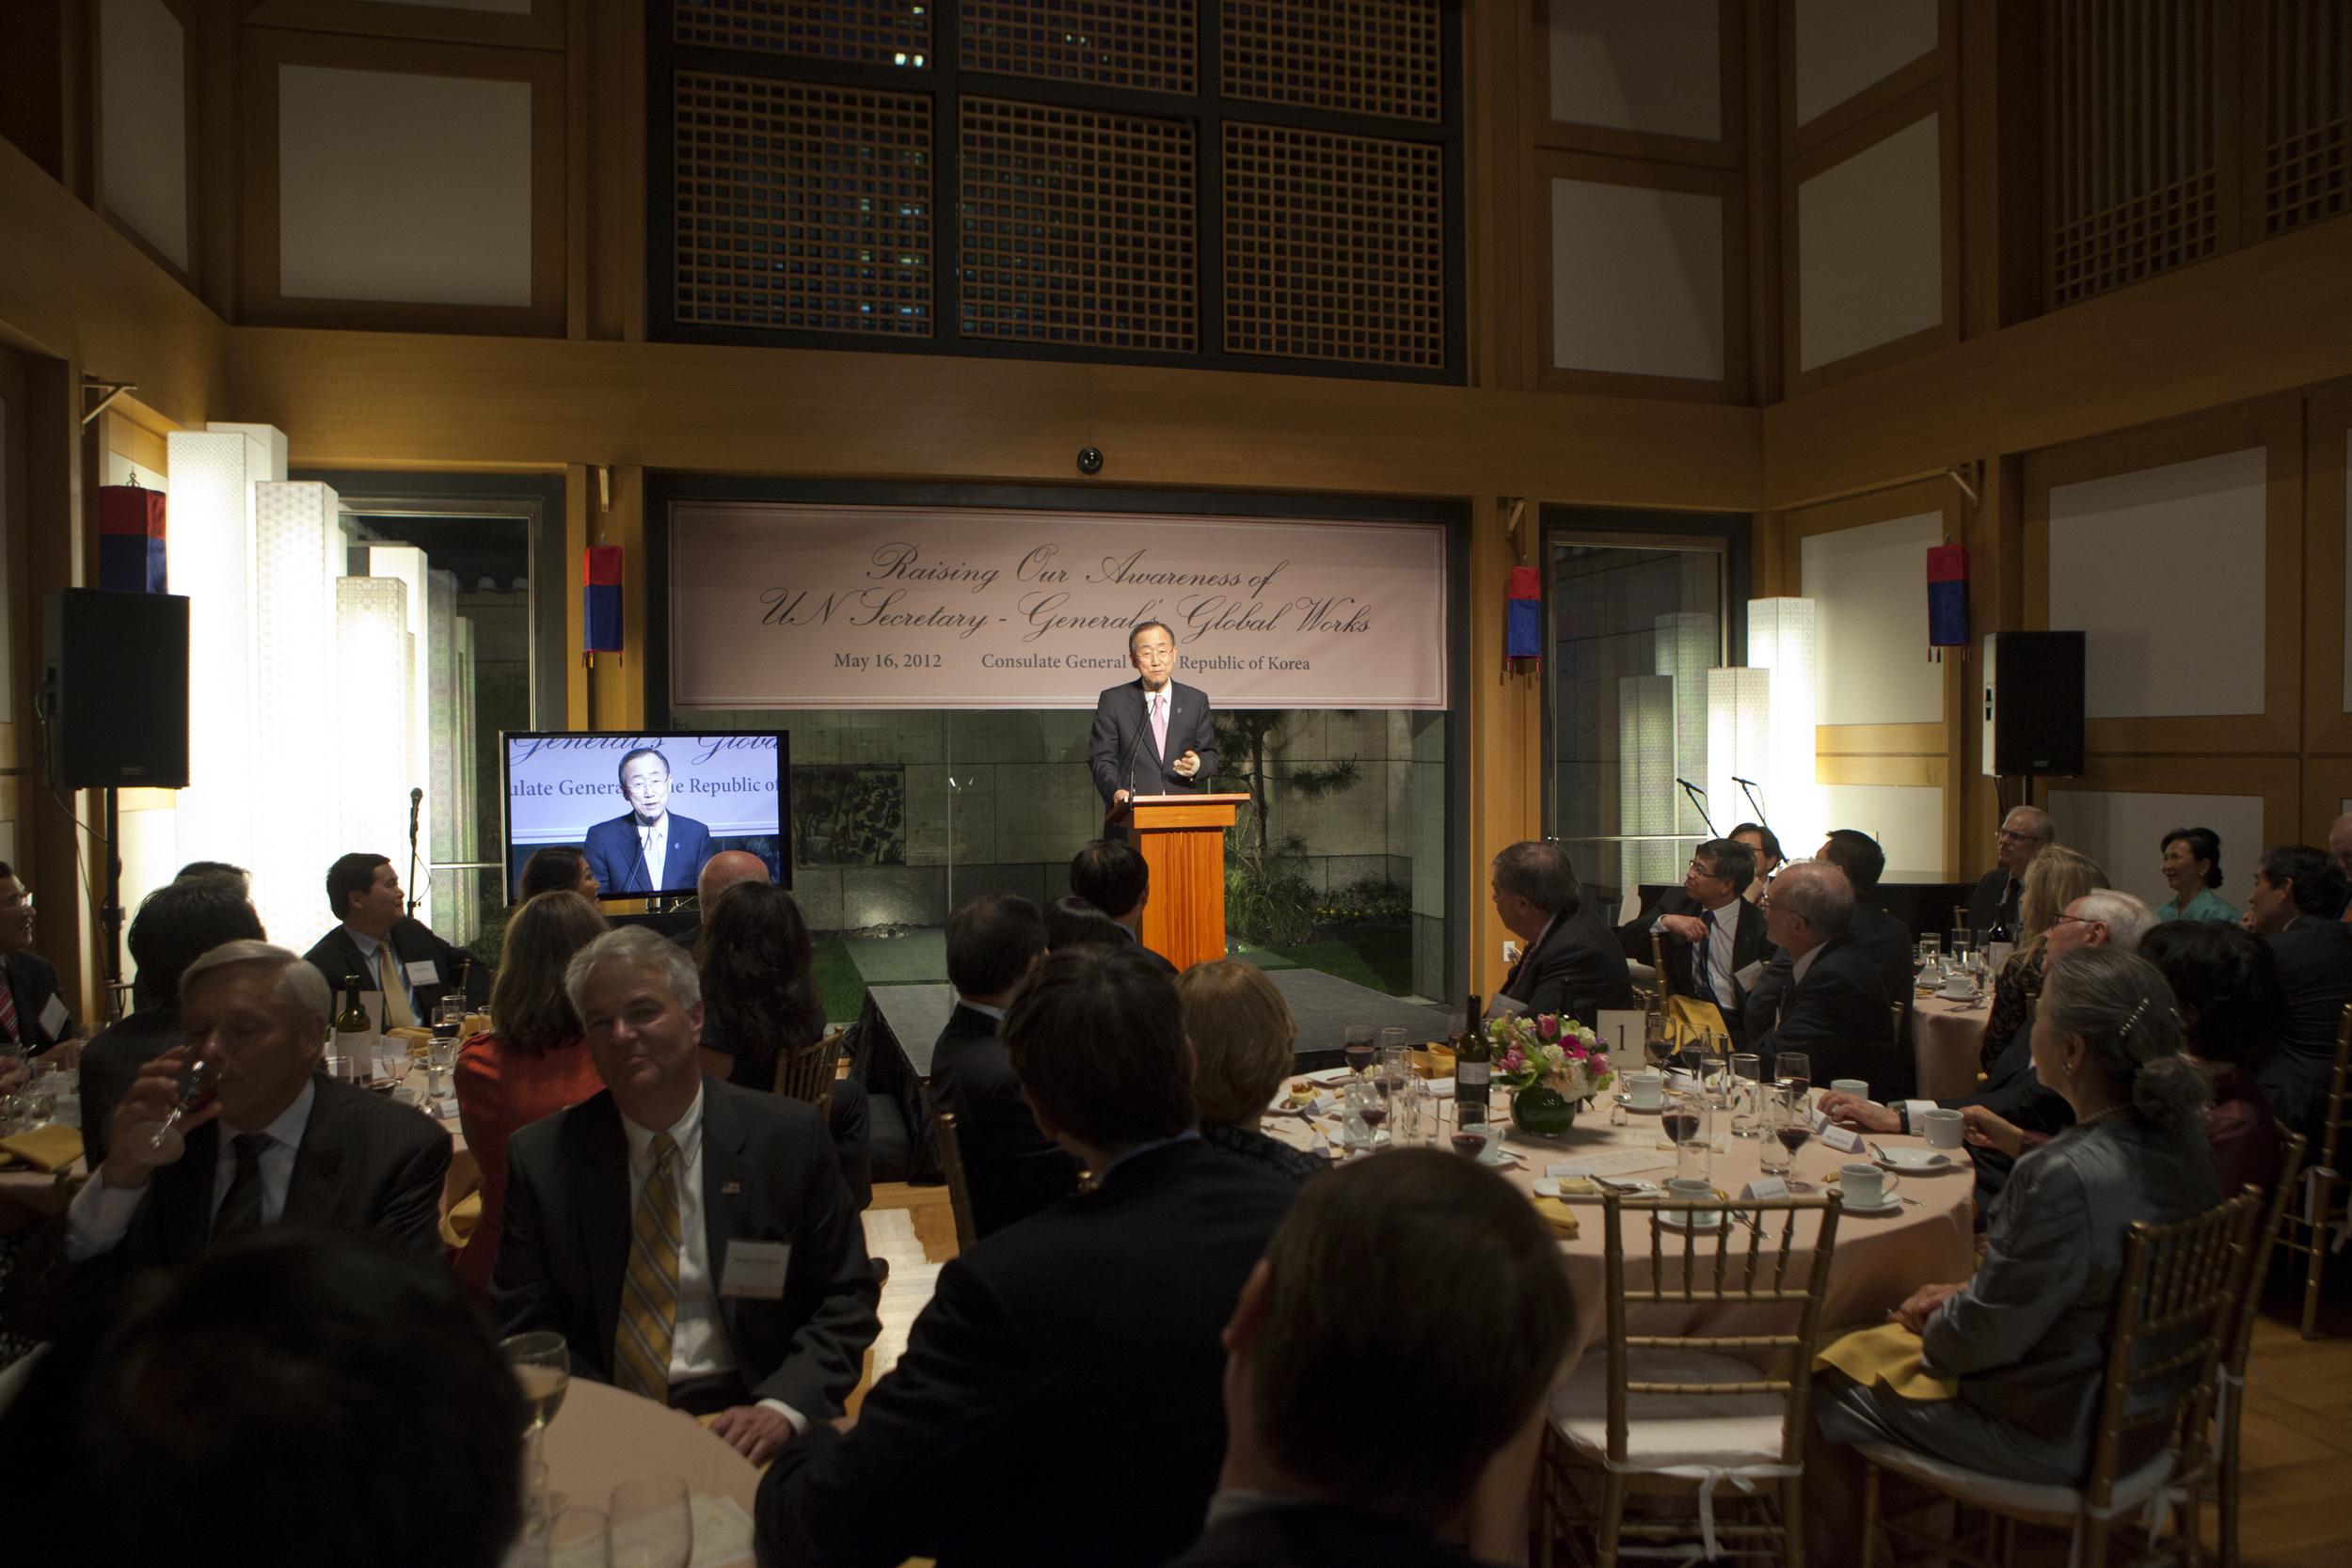 Dinner in Honor of U.N. Secretary Ban Ki-moon